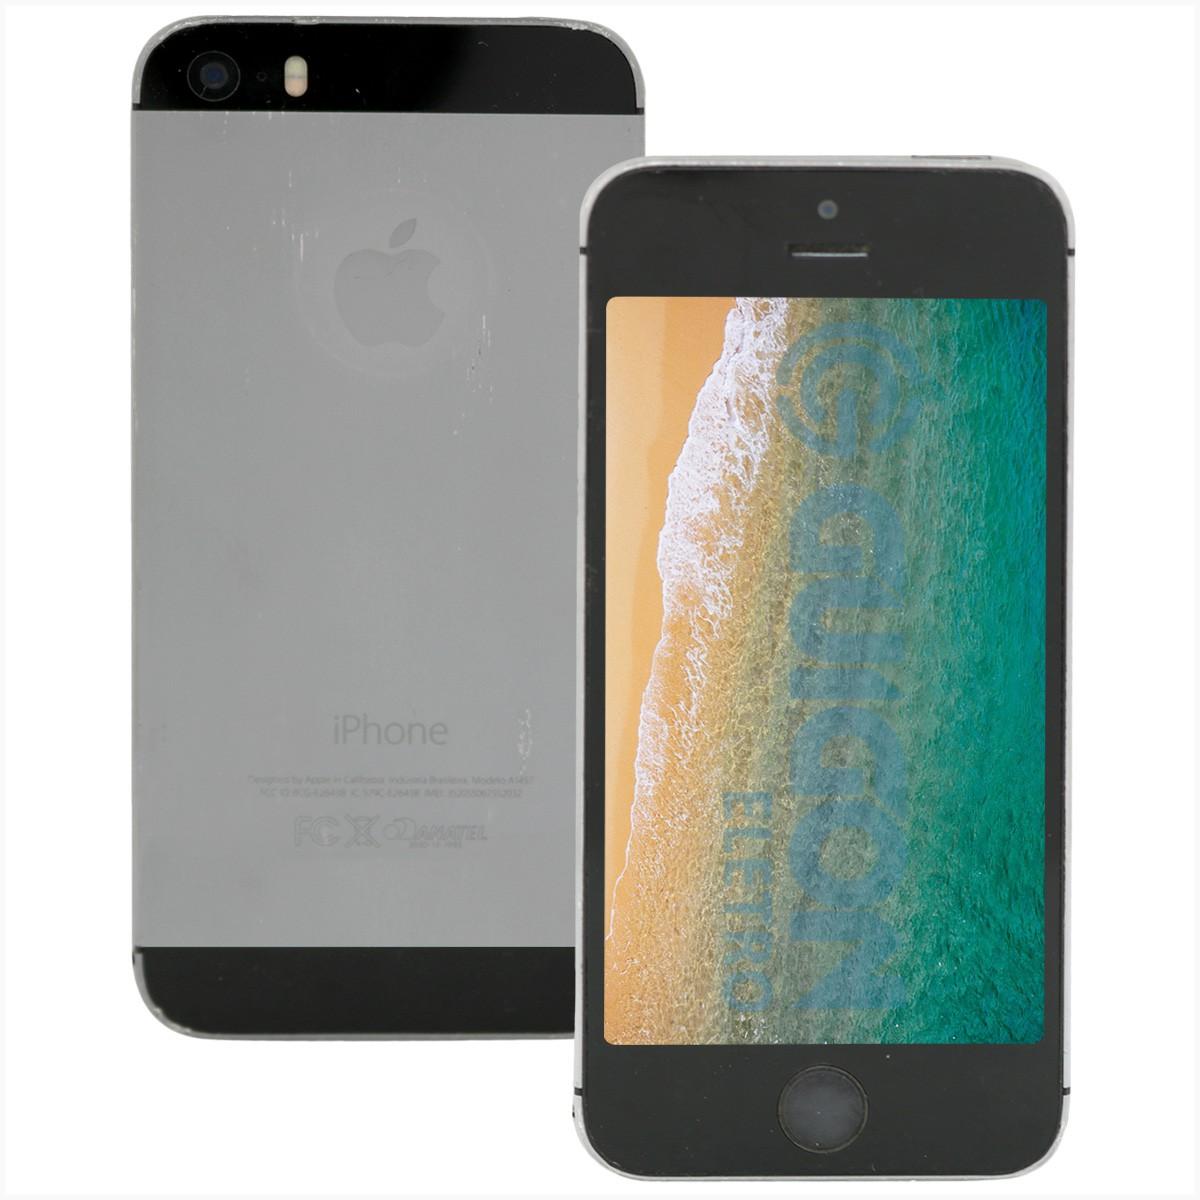 Iphone 5s apple a1457 - usado